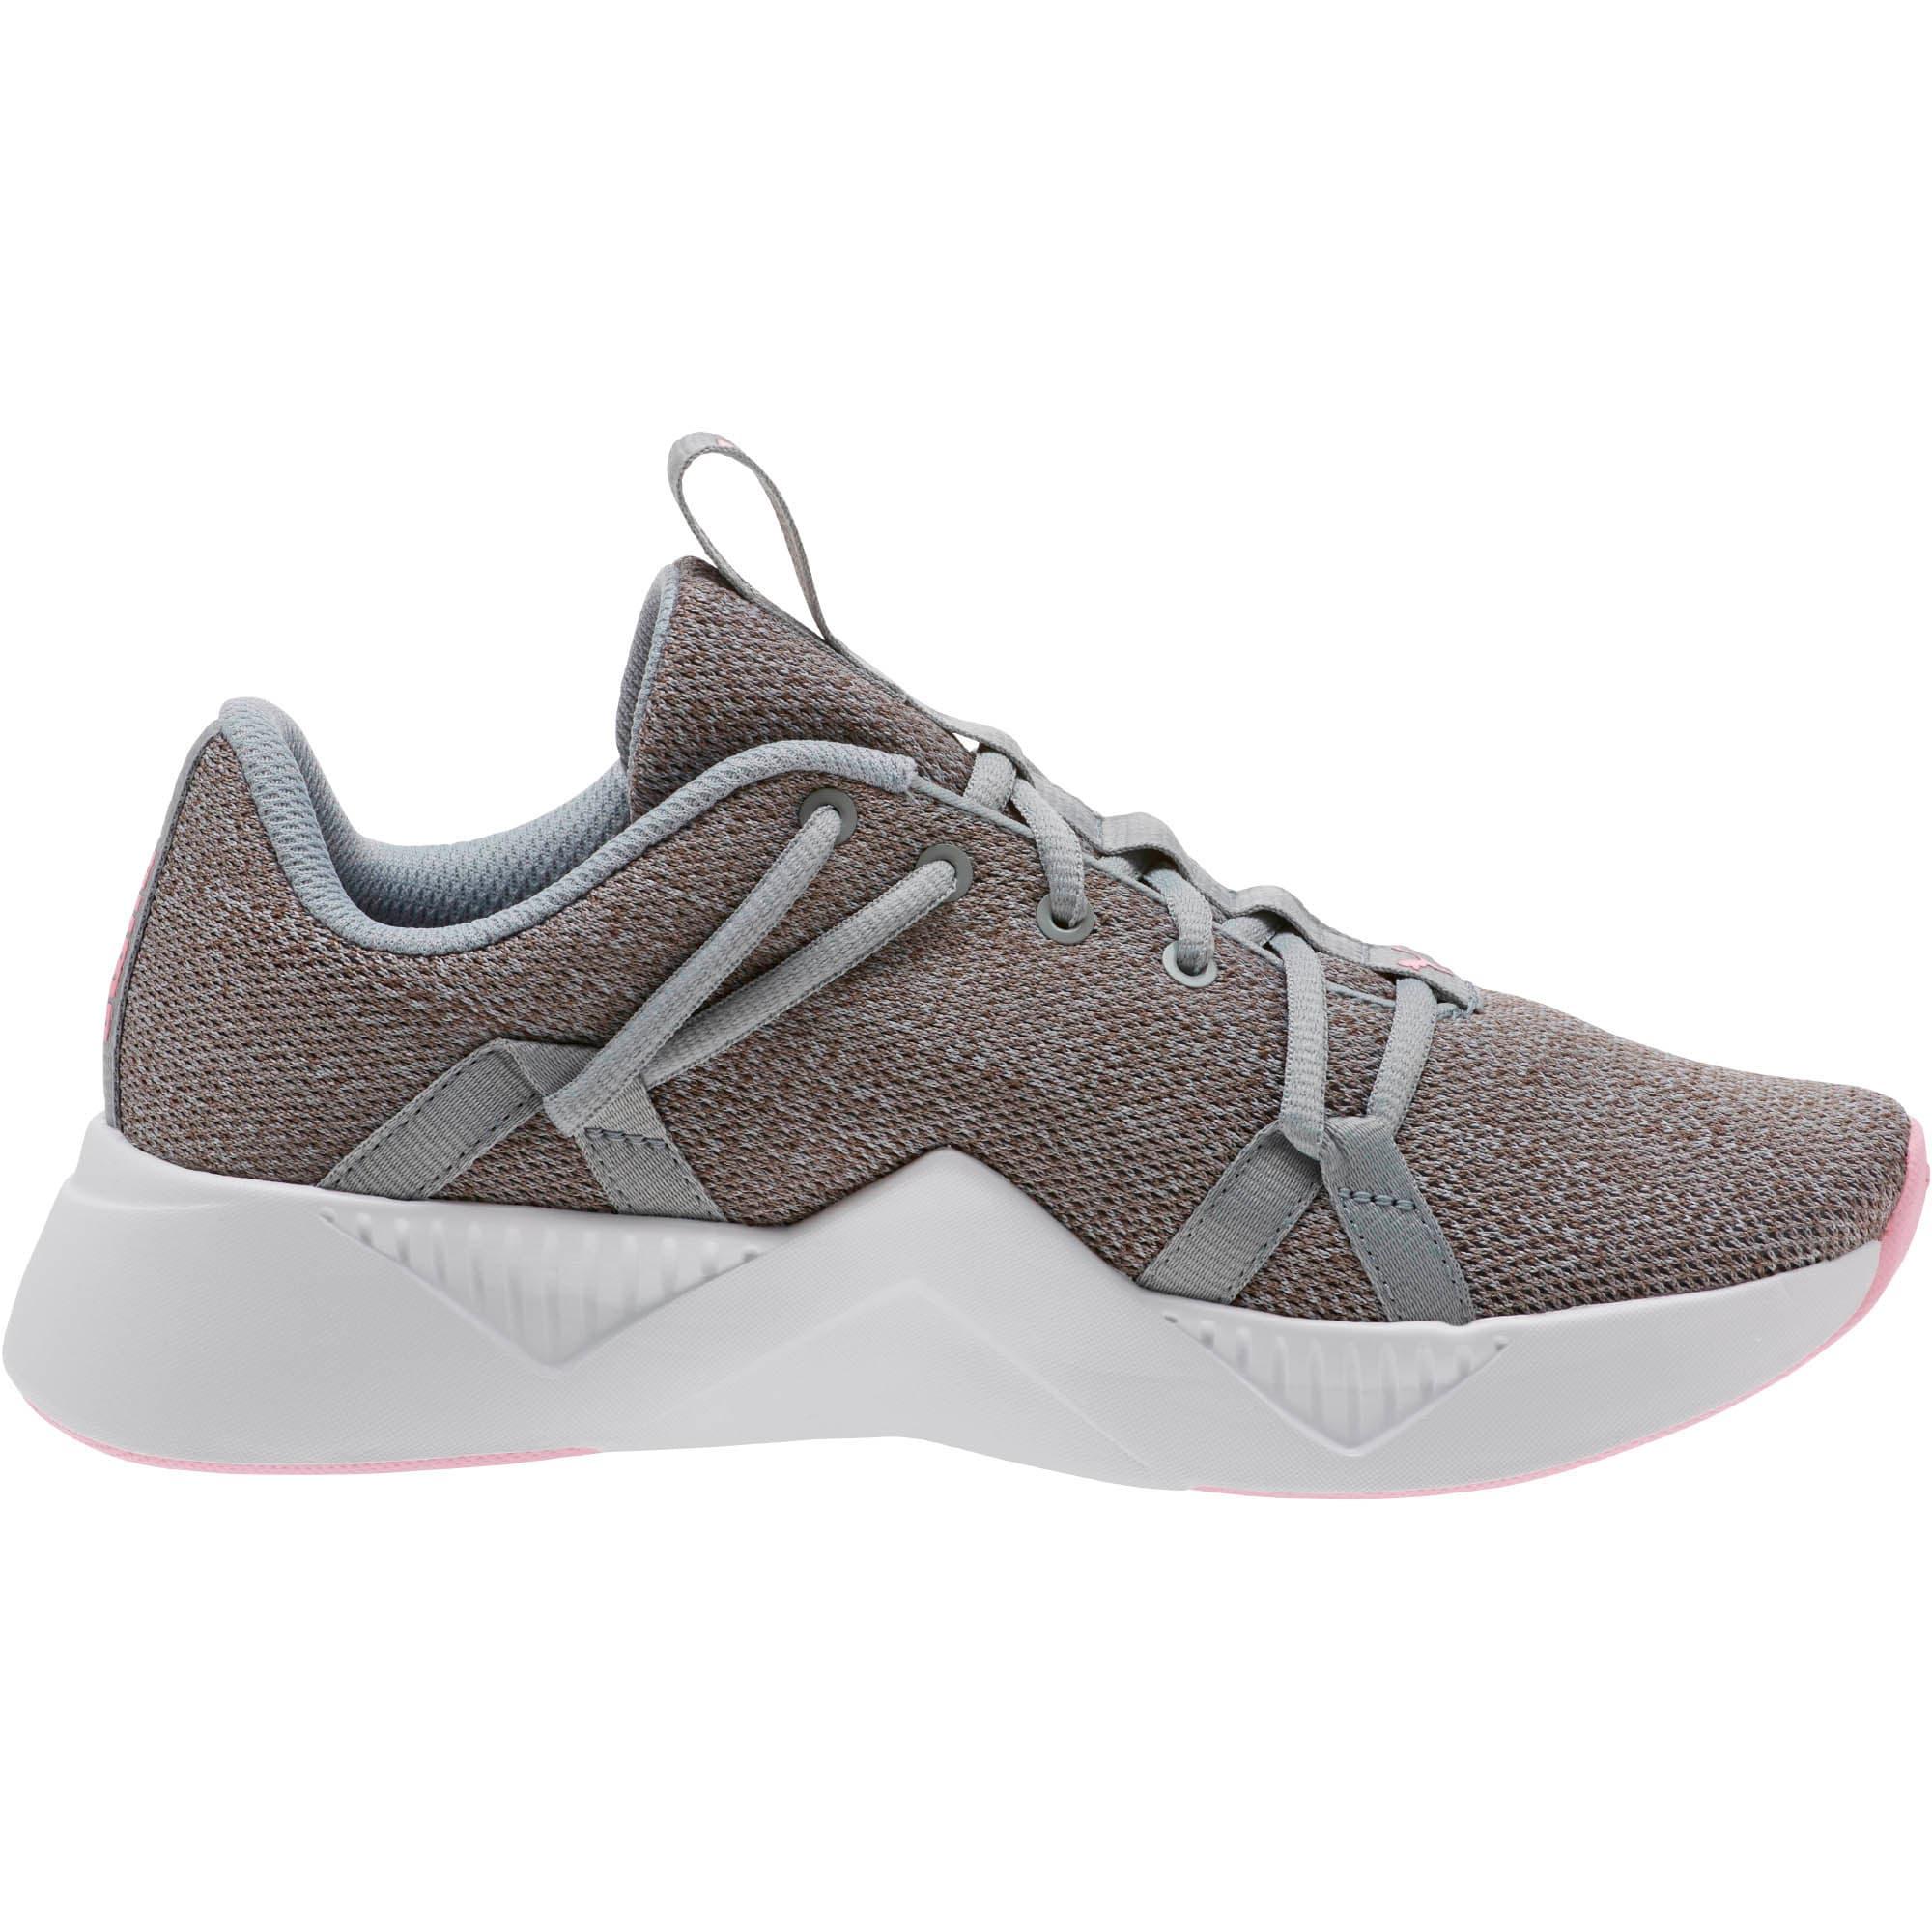 Thumbnail 3 of Incite Knit Women's Training Shoes, Quarry-Pale Pink, medium